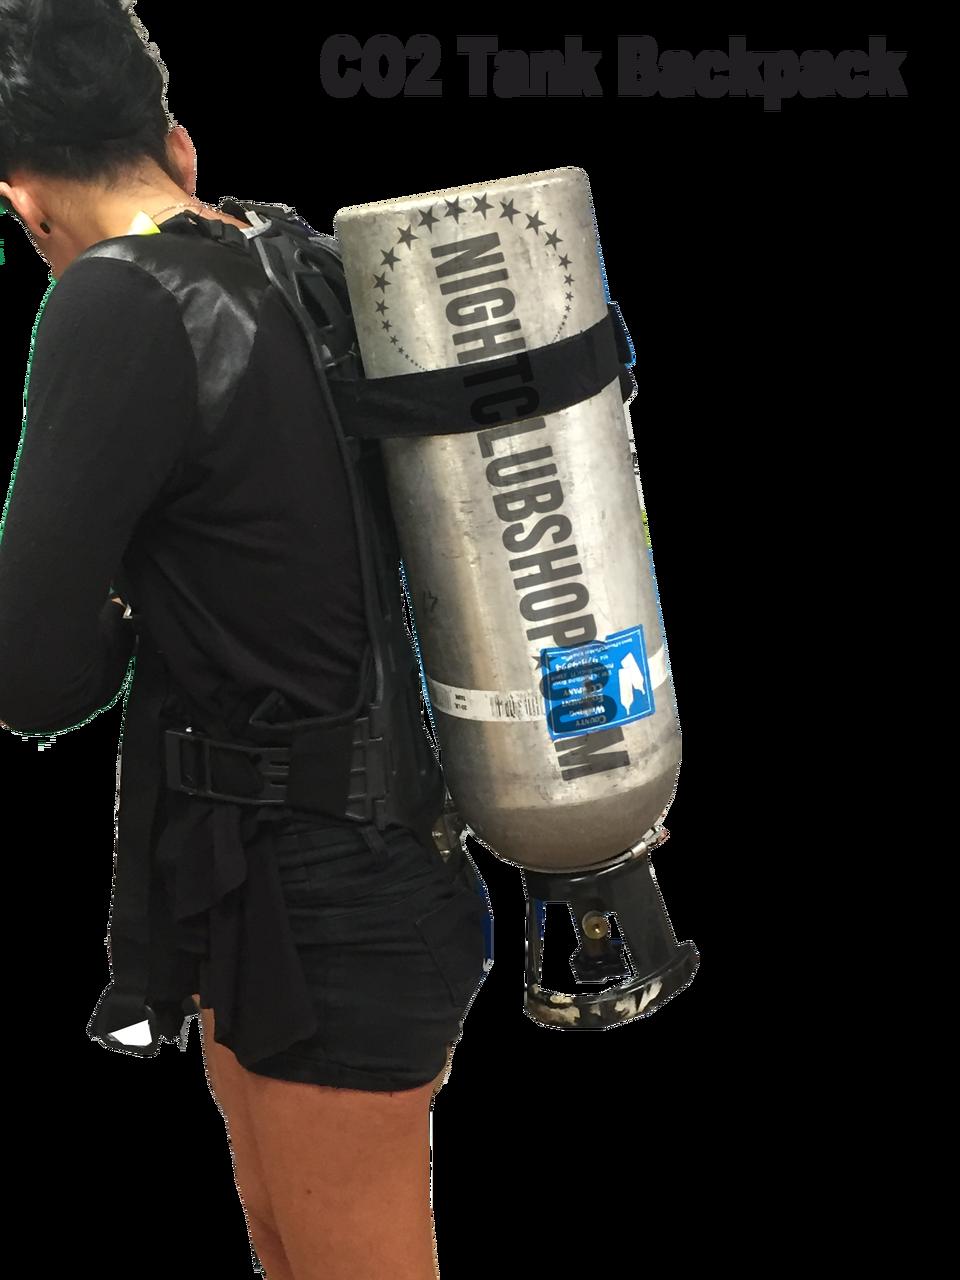 CO2, gas, gun,backpack, nightclub, cylinder, aluminum,20, 20 lb,co2 bazooka, stage,effect,mobile,co2 bazooka, co2 cannon,back pack, co2 gun, back pack, hose,kit,package